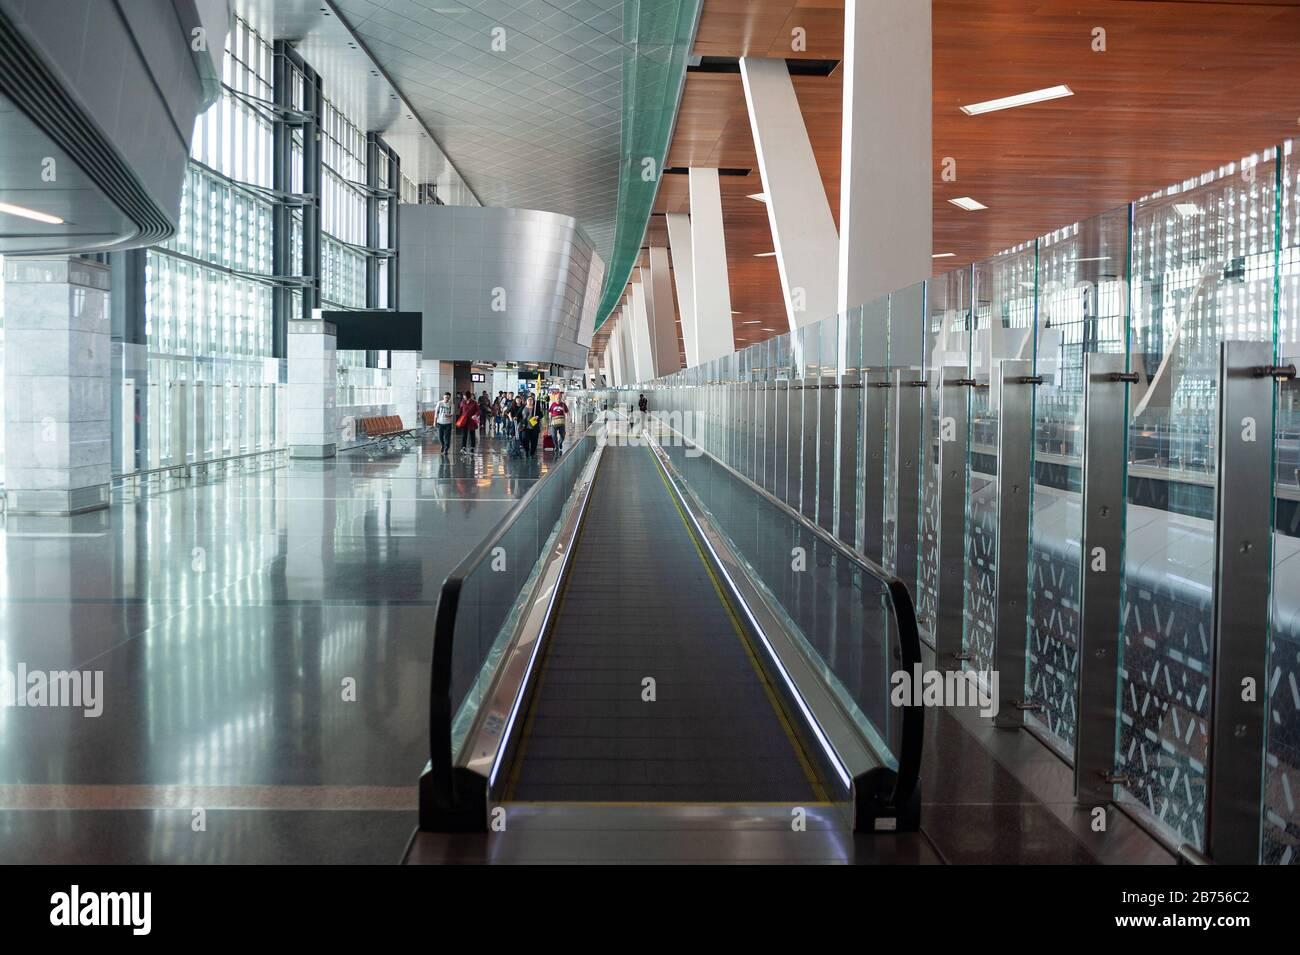 05.06.2019, Doha, Qatar - Interior view of the new Hamad International Airport. [automated translation] Stock Photo